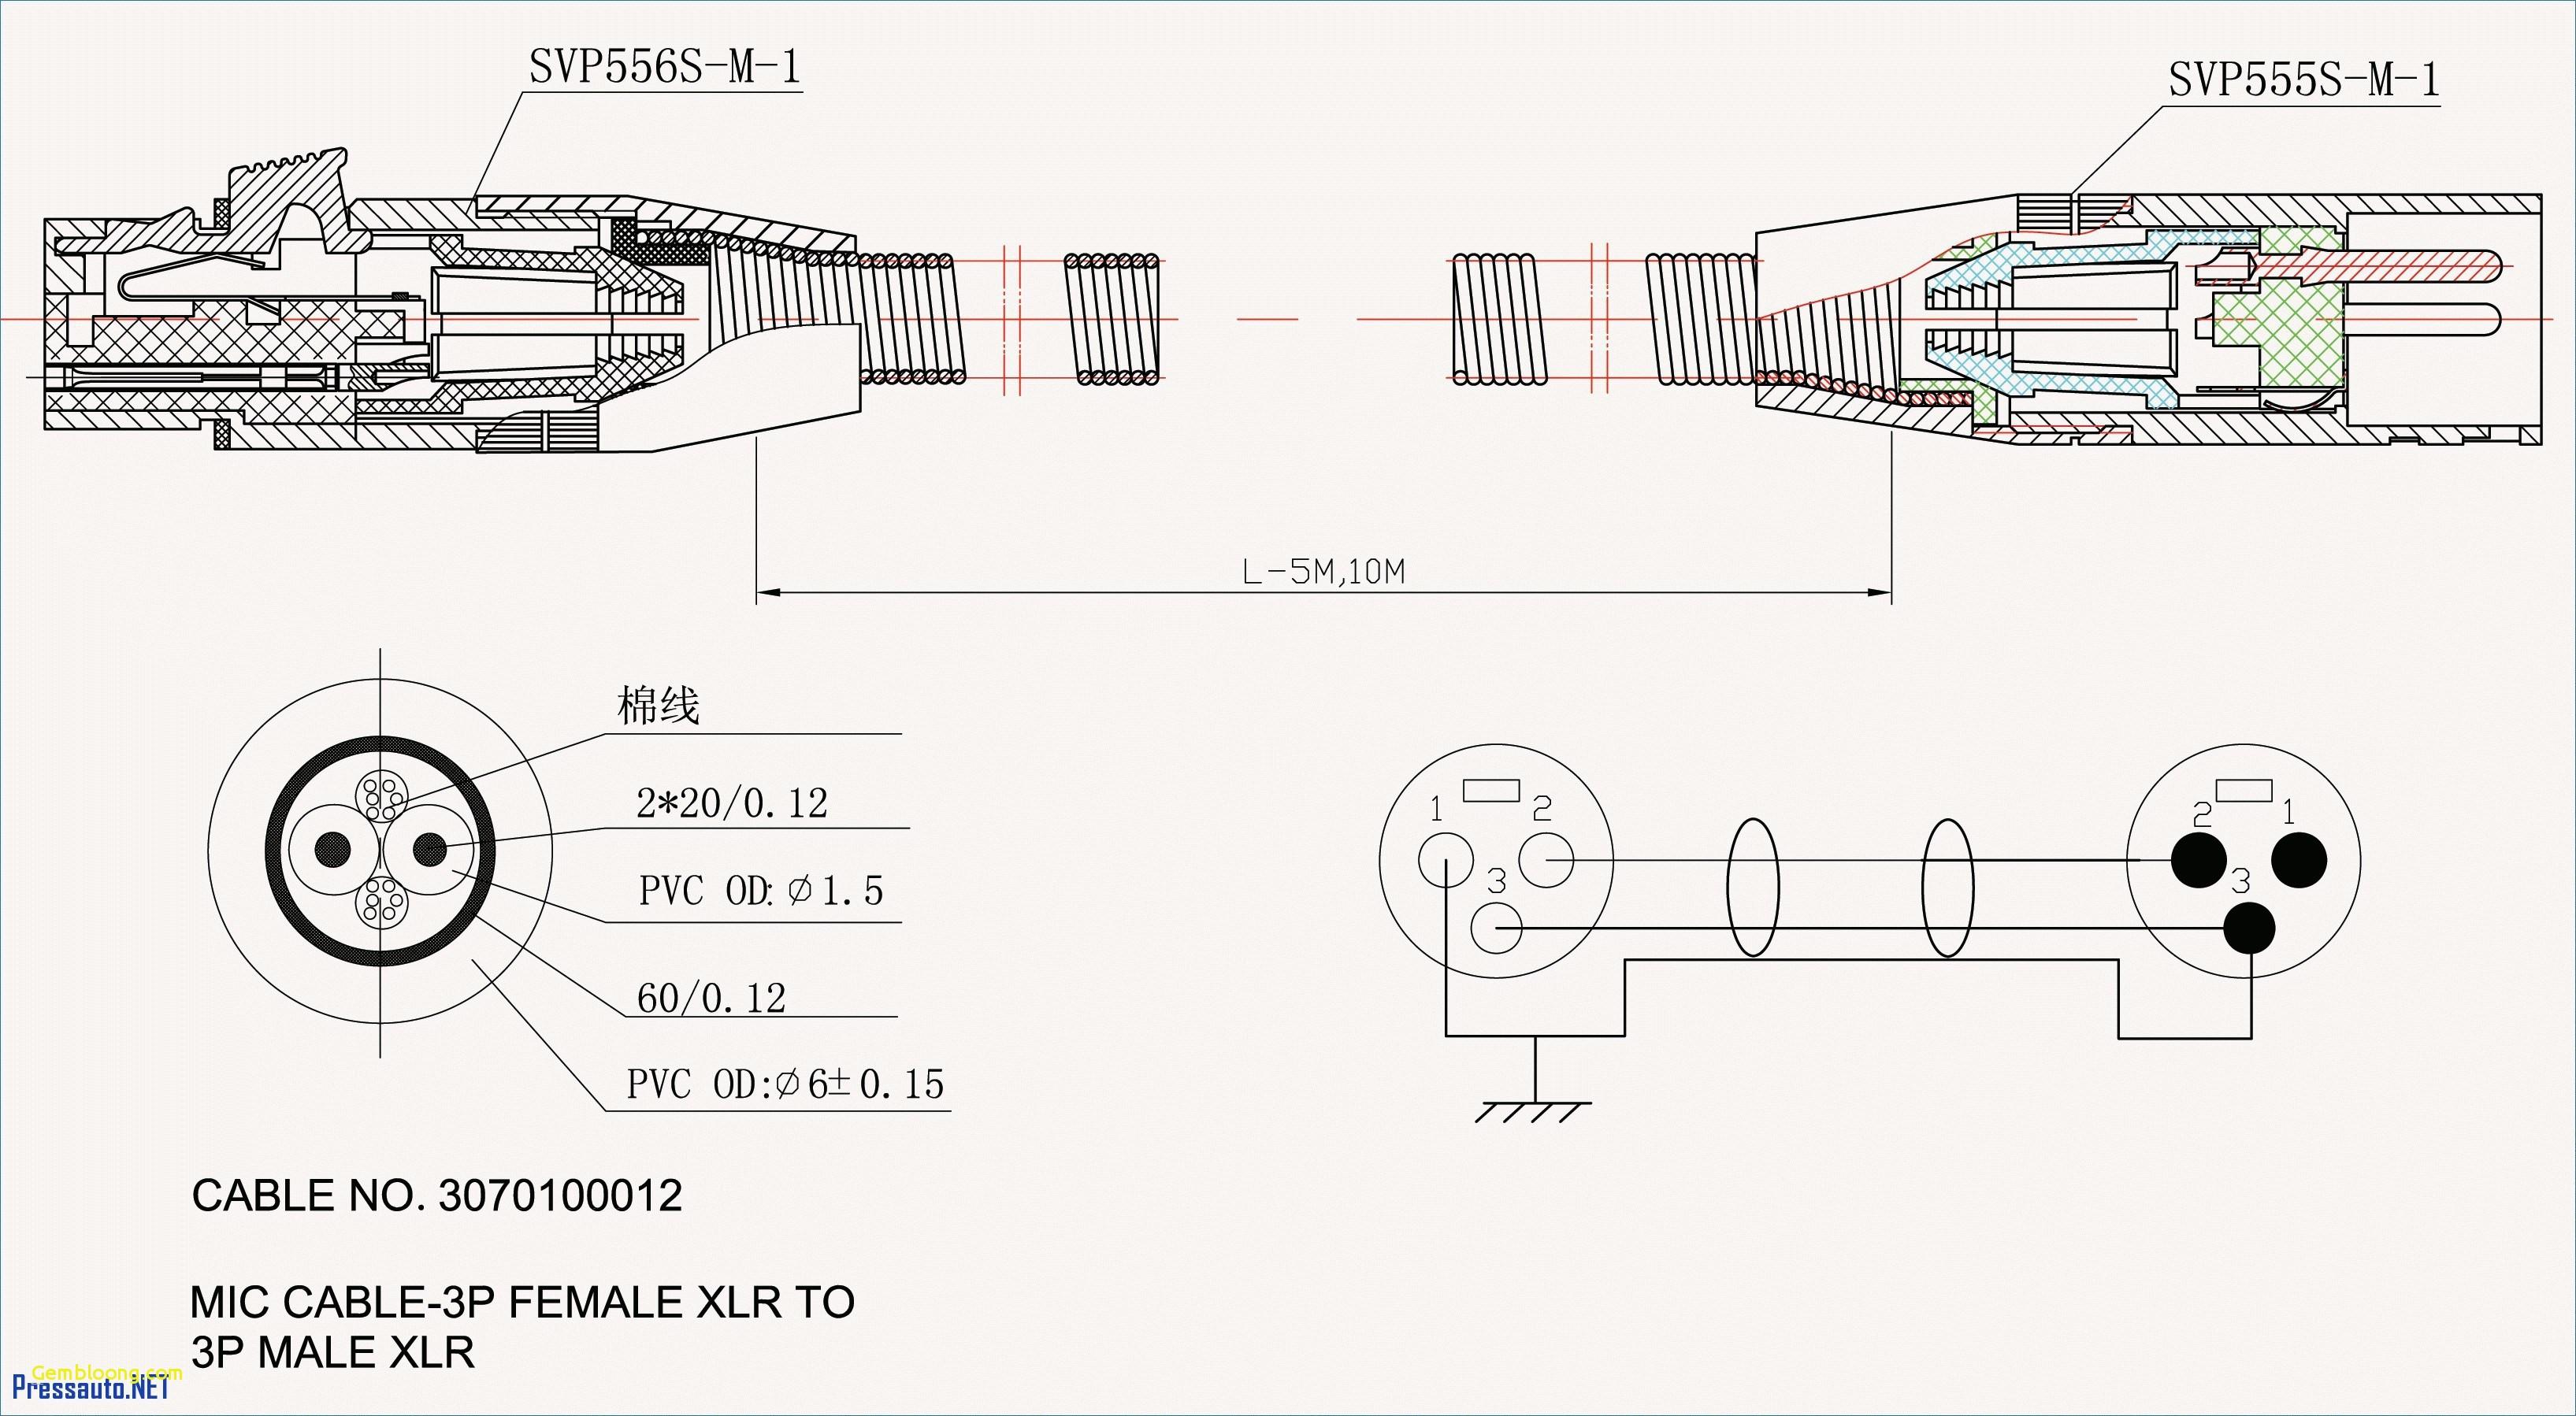 Under the Hood Of A Car Diagram Free Bmw E36 Dme Wiring Diagram E36 Wiring Diagram – Wiring Diagram Of Under the Hood Of A Car Diagram